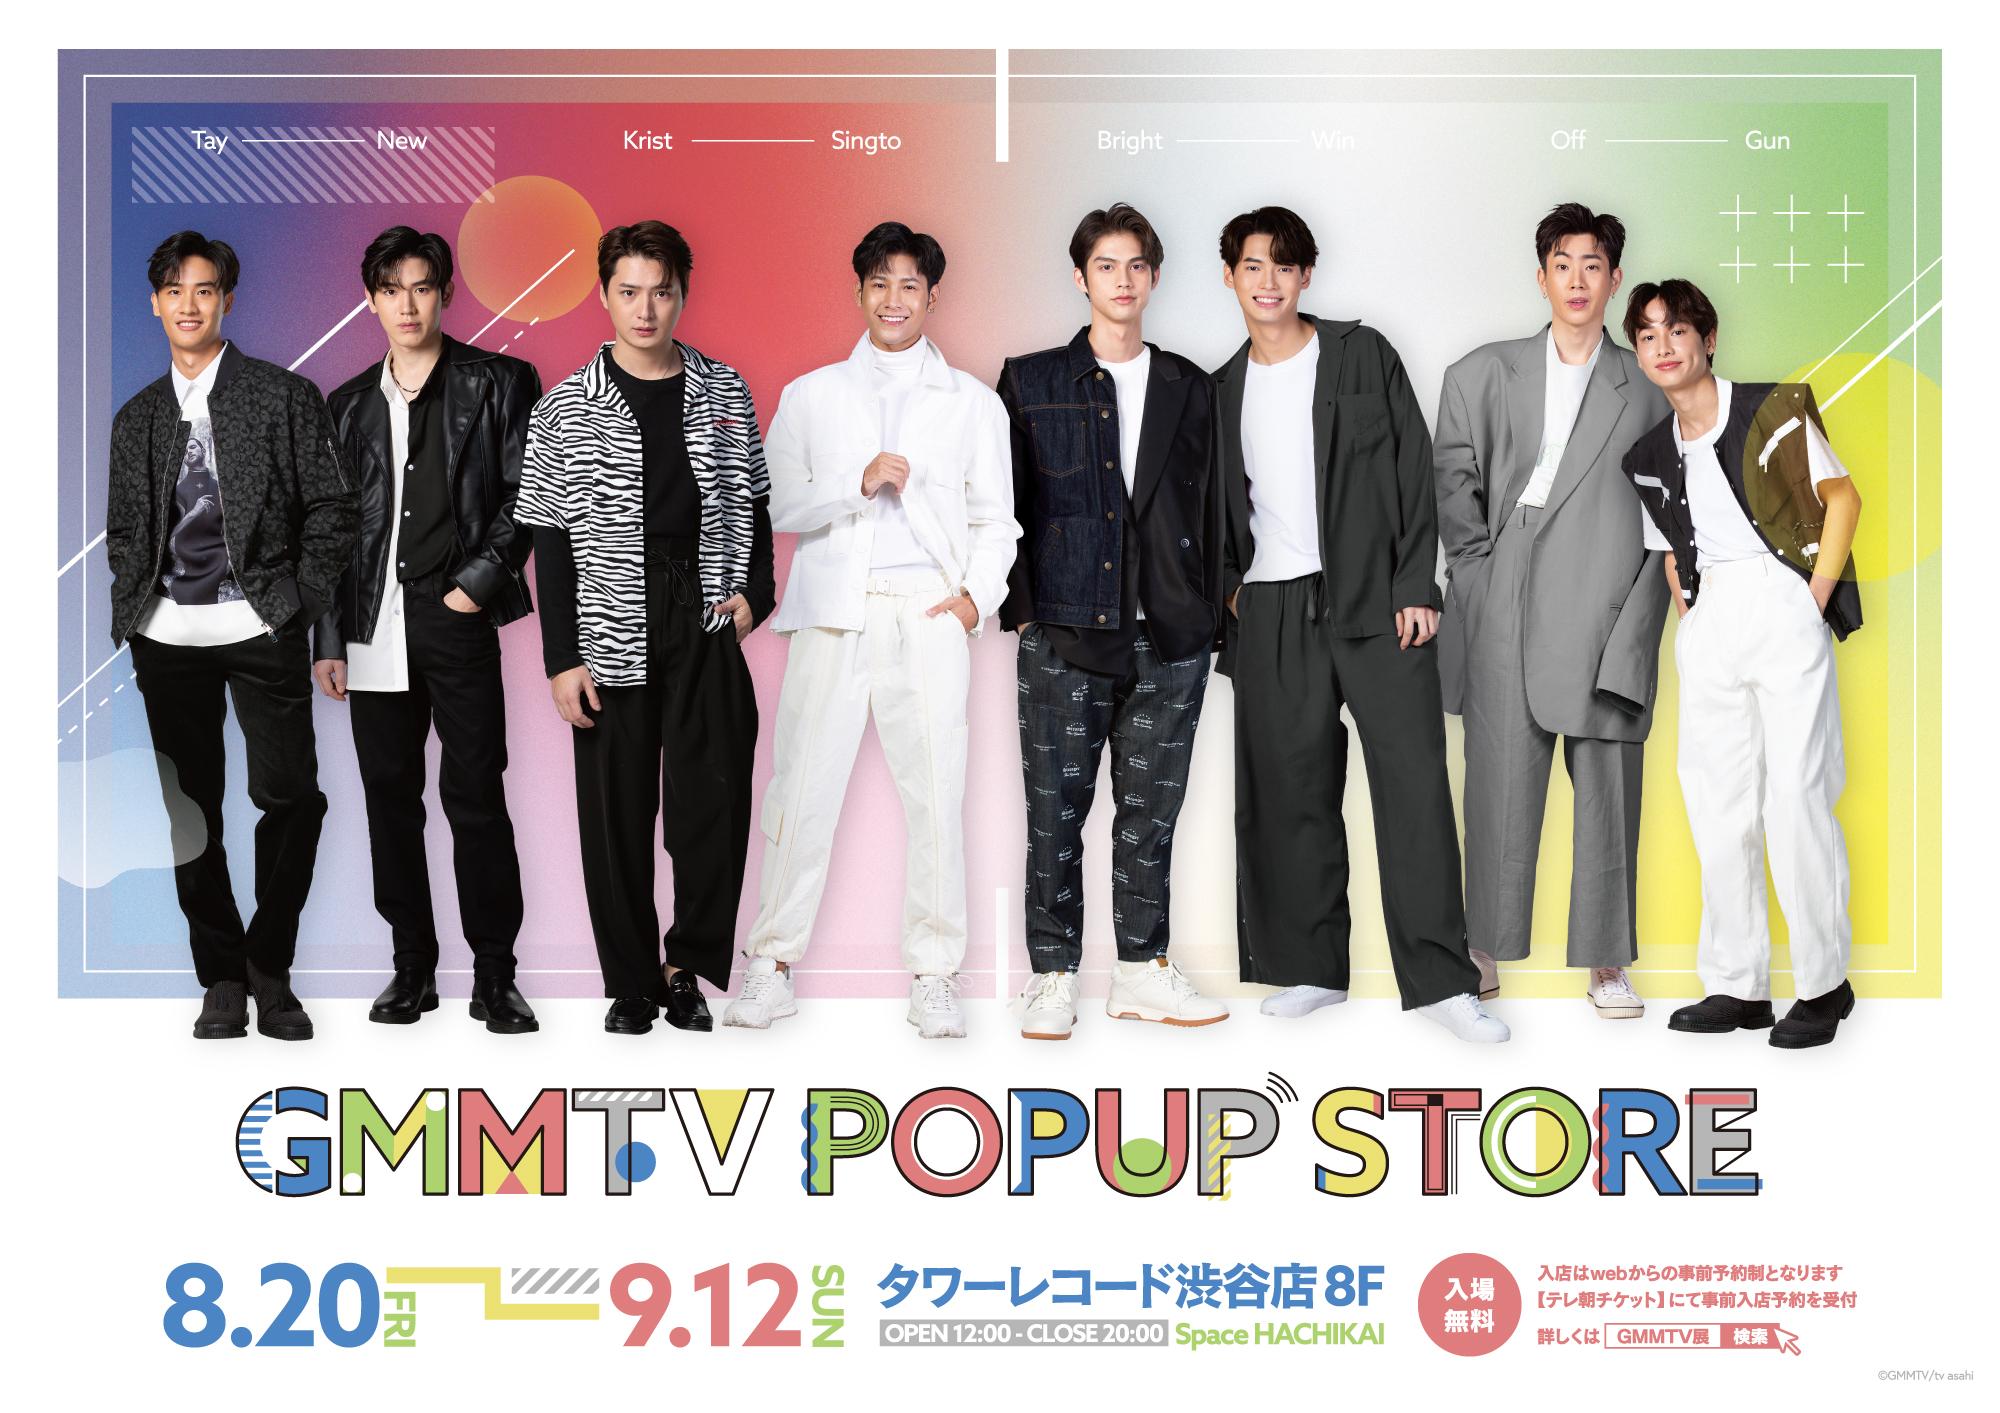 「GMMTV POPUP STORE」タワレコ渋谷店にて期間限定開催決定!GMMTVタイドラマ四天王ペアの新グッズも発売